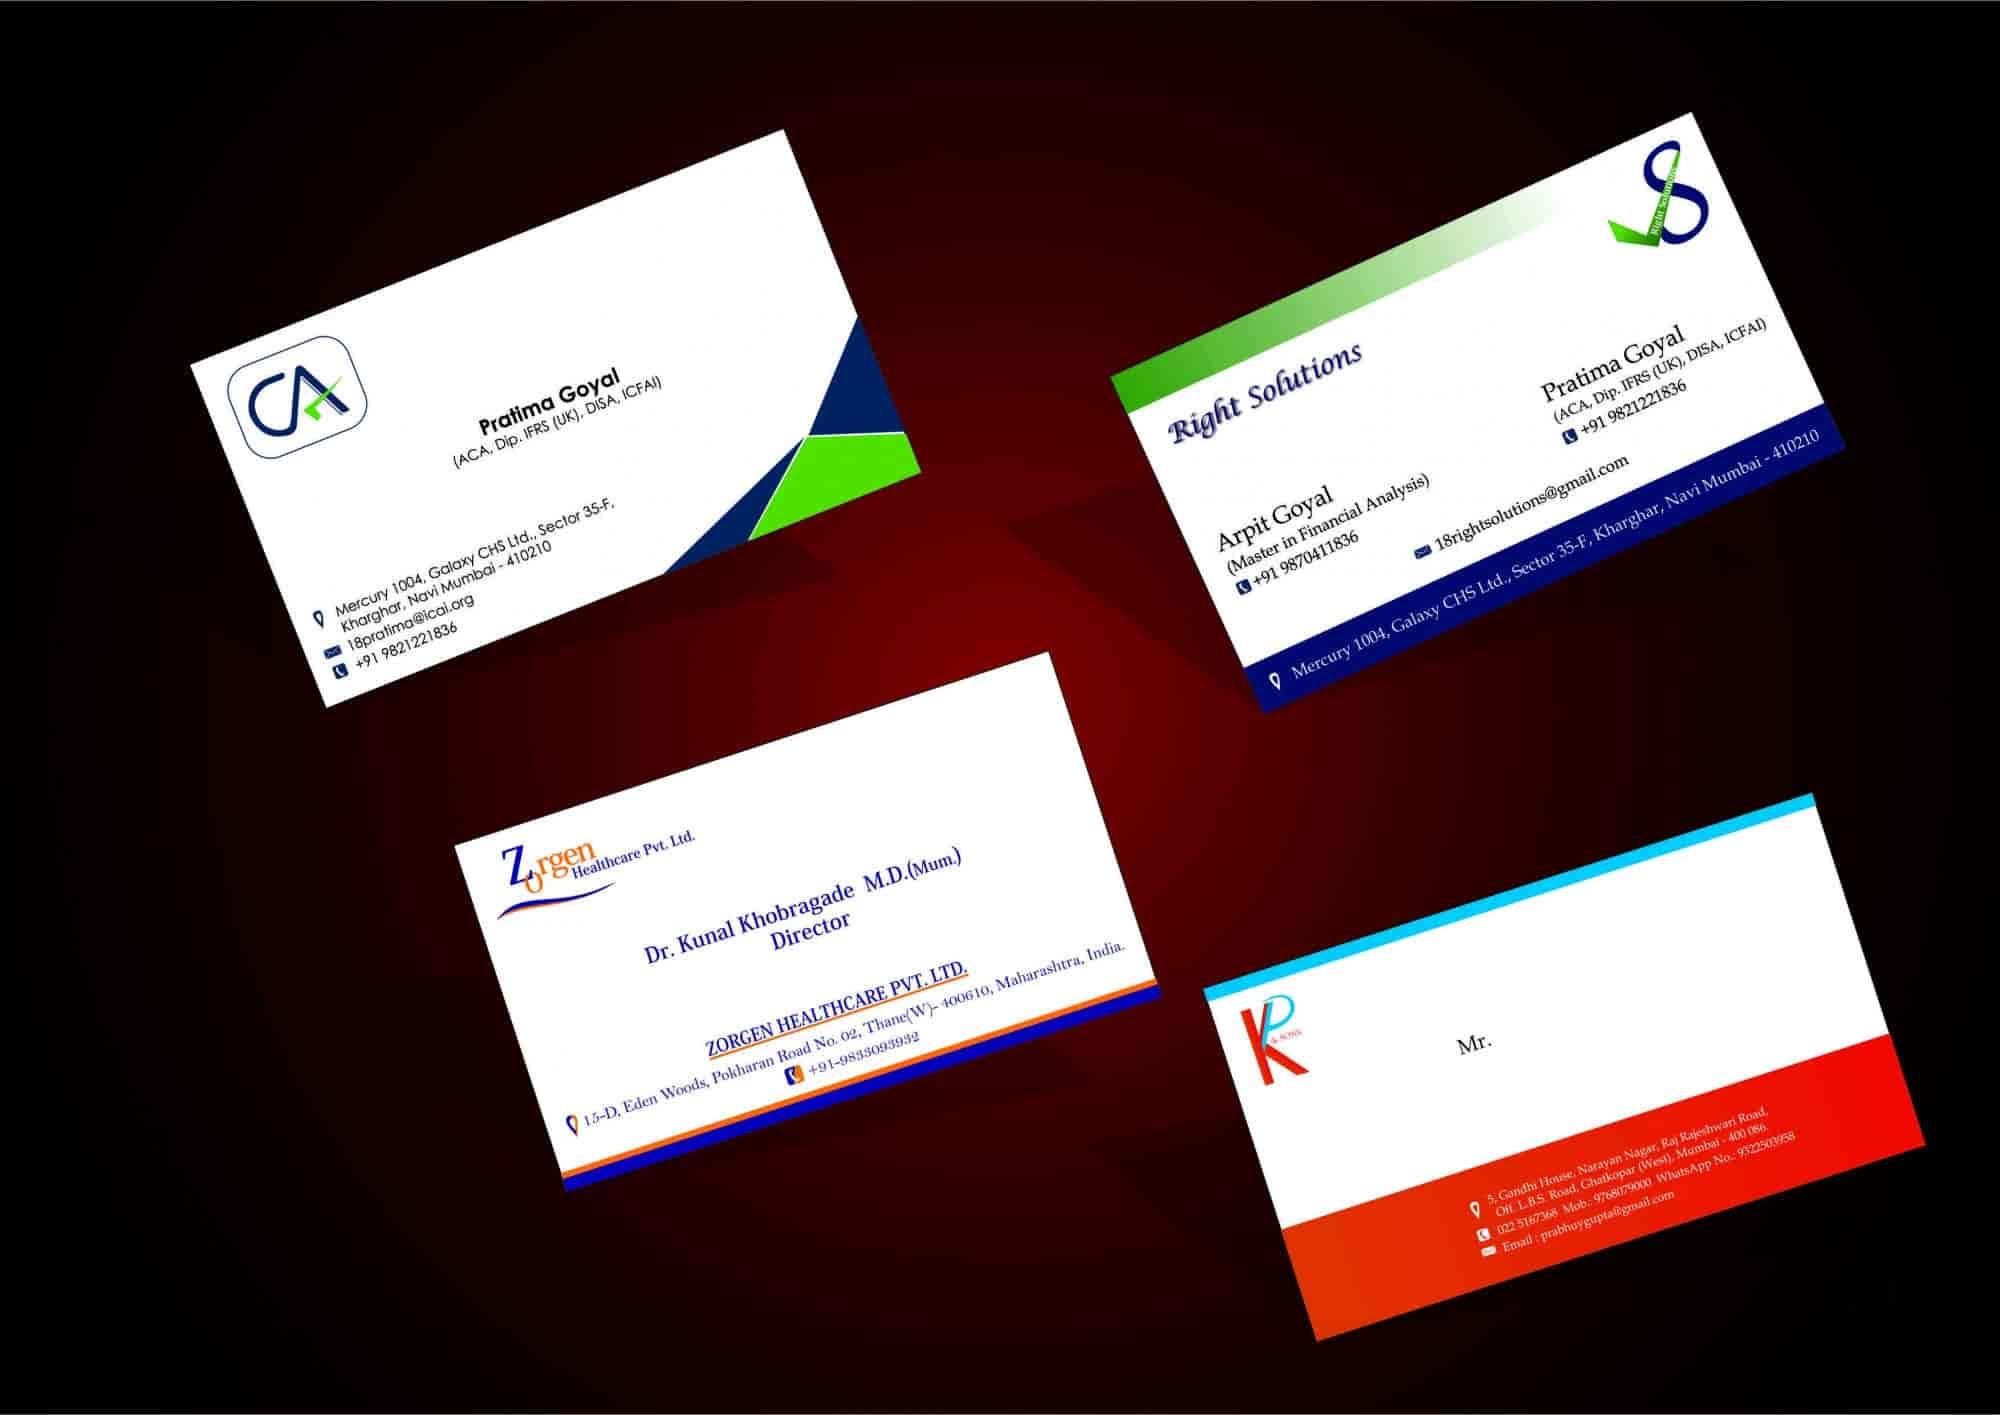 Adwaik creative concepts photos kopar khairane mumbai pictures visiting card design adwaik creative concepts photos kopar khairane navi mumbai computer reheart Choice Image